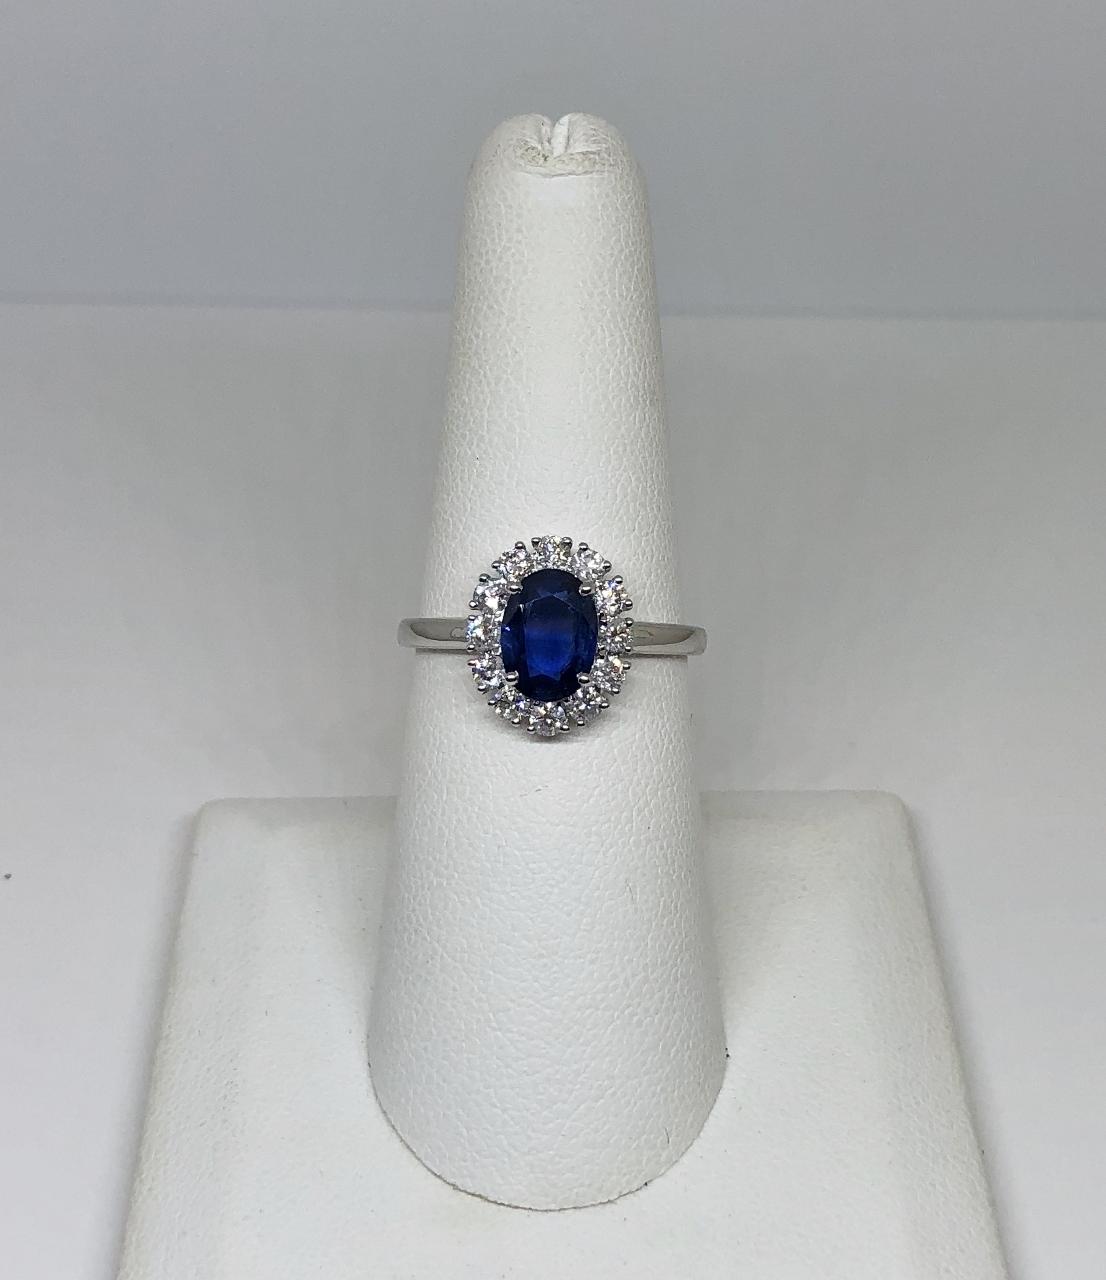 1 Carat Sapphire Diamond White Gold Ring